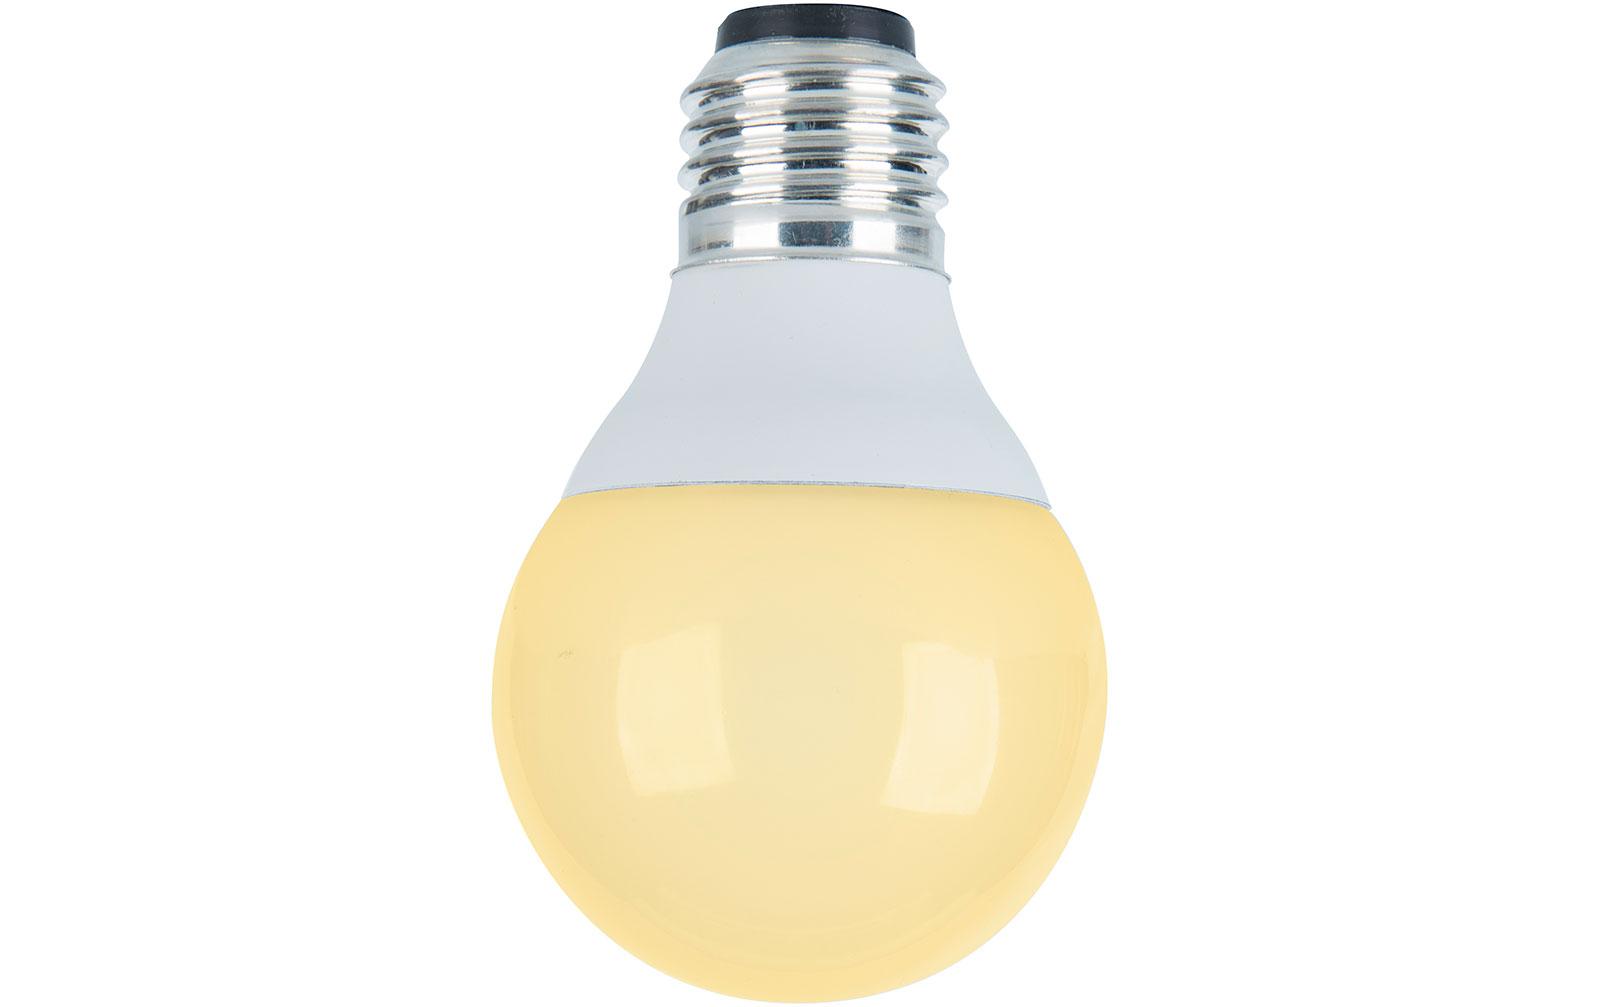 chauvet-dj-festoon-vari-white-lamp-set-20pcs-